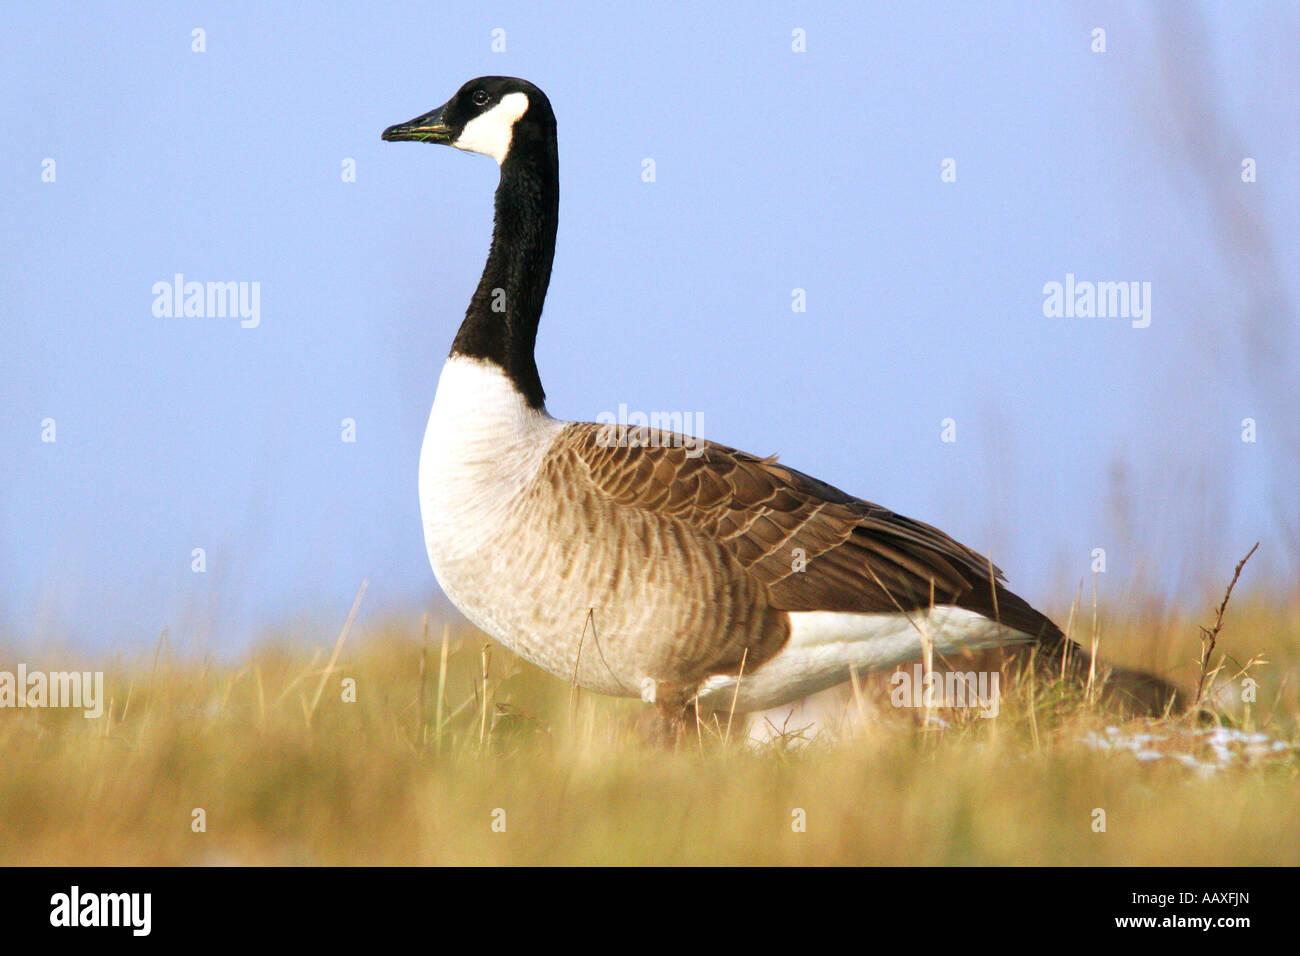 Tiere Voegel Gaensevoegel Kanadagans Canada Goose Branta canadensis - Stock Image